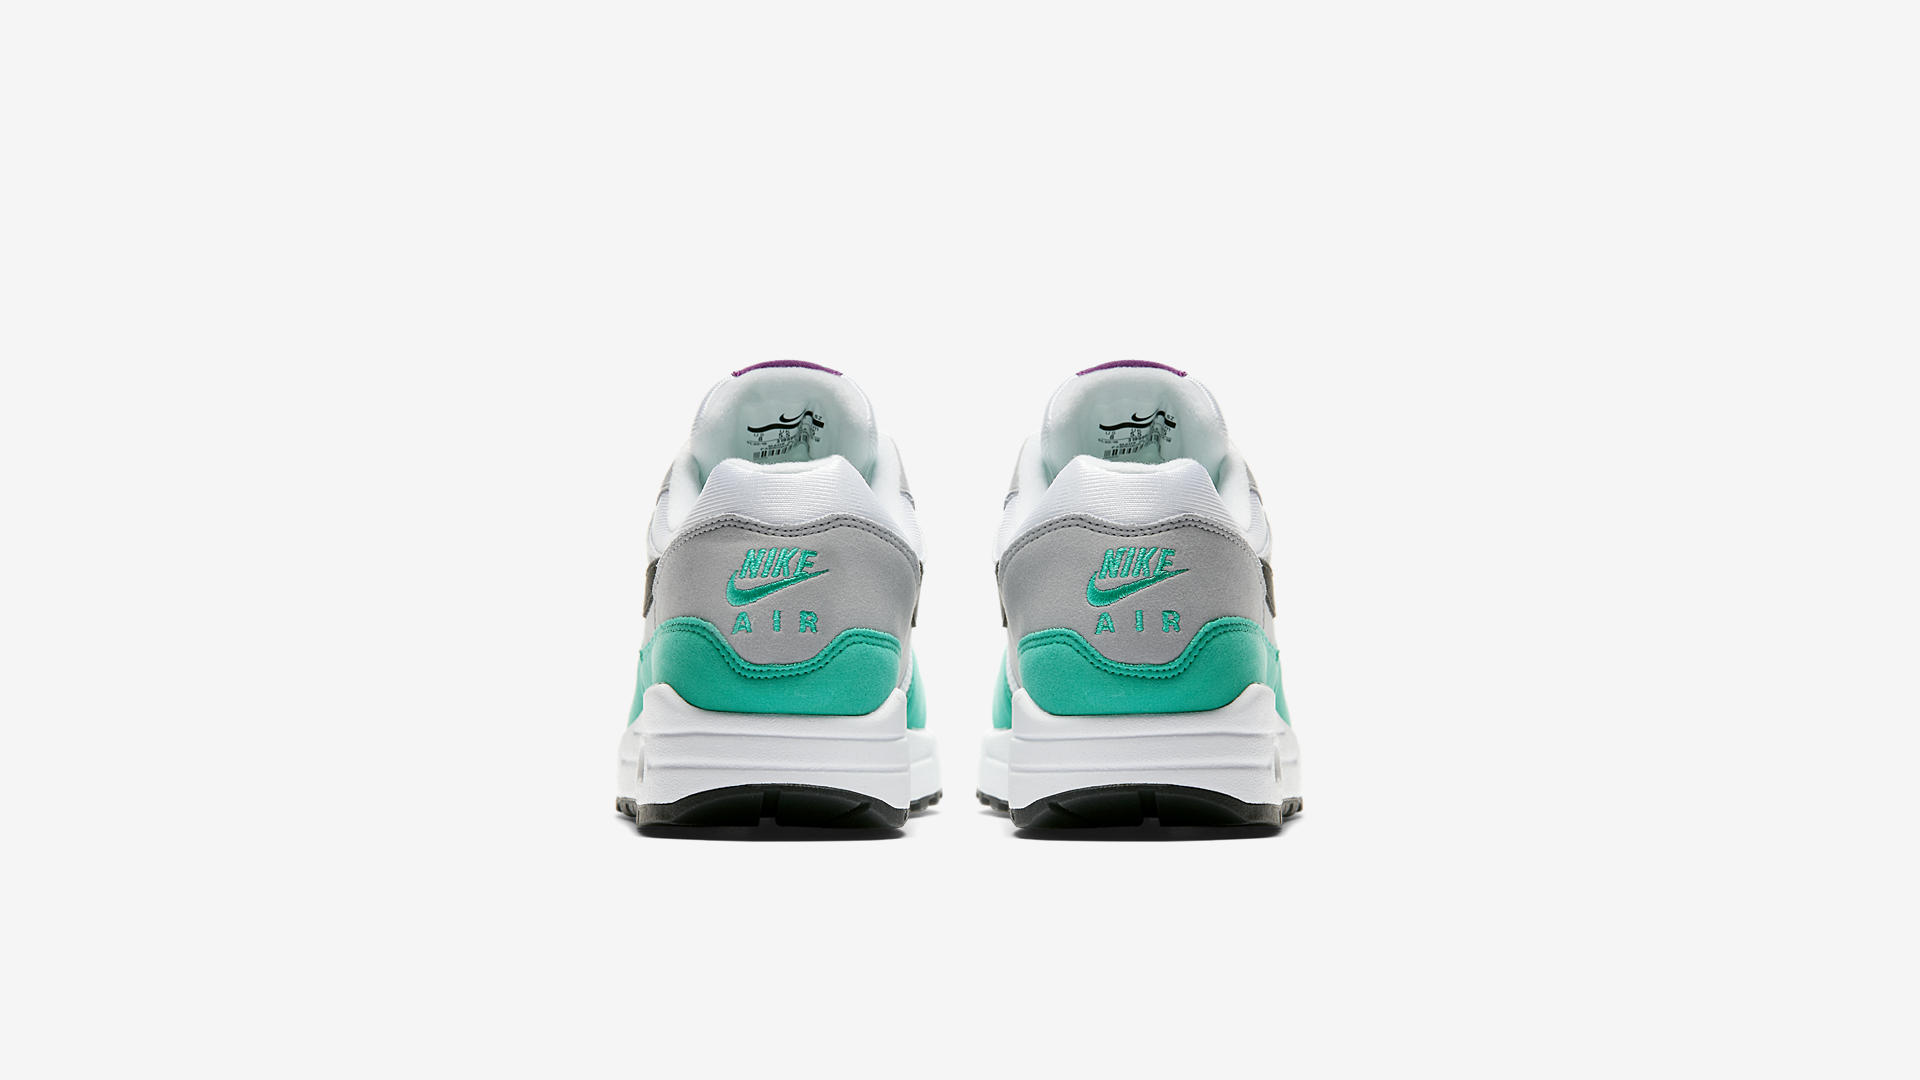 Nike Air Max 1 White/Black-Wolf Grey-Clear Emerald (319986-115)